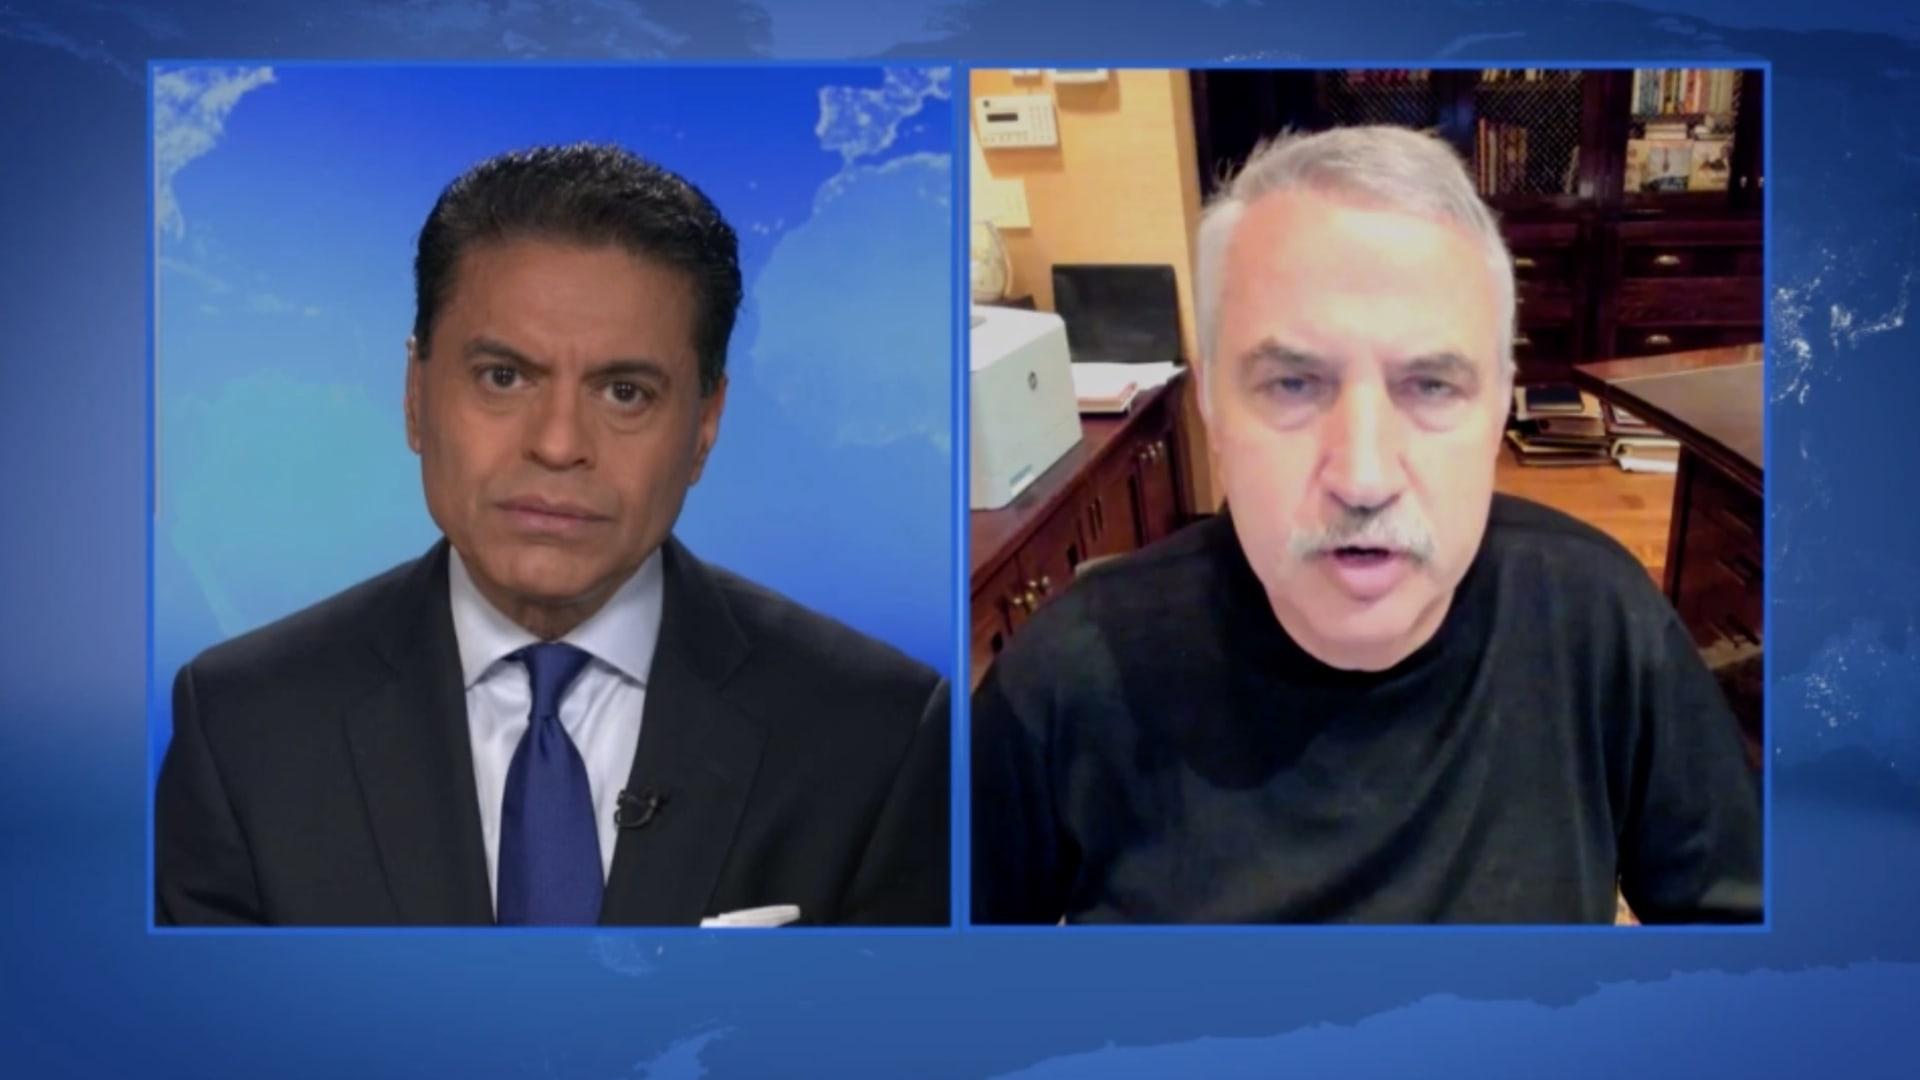 فريدمان لـGPS: ربما نشاهد في جو بايدن.. آخر رئيس ديمقراطي مؤيد لإسرائيل